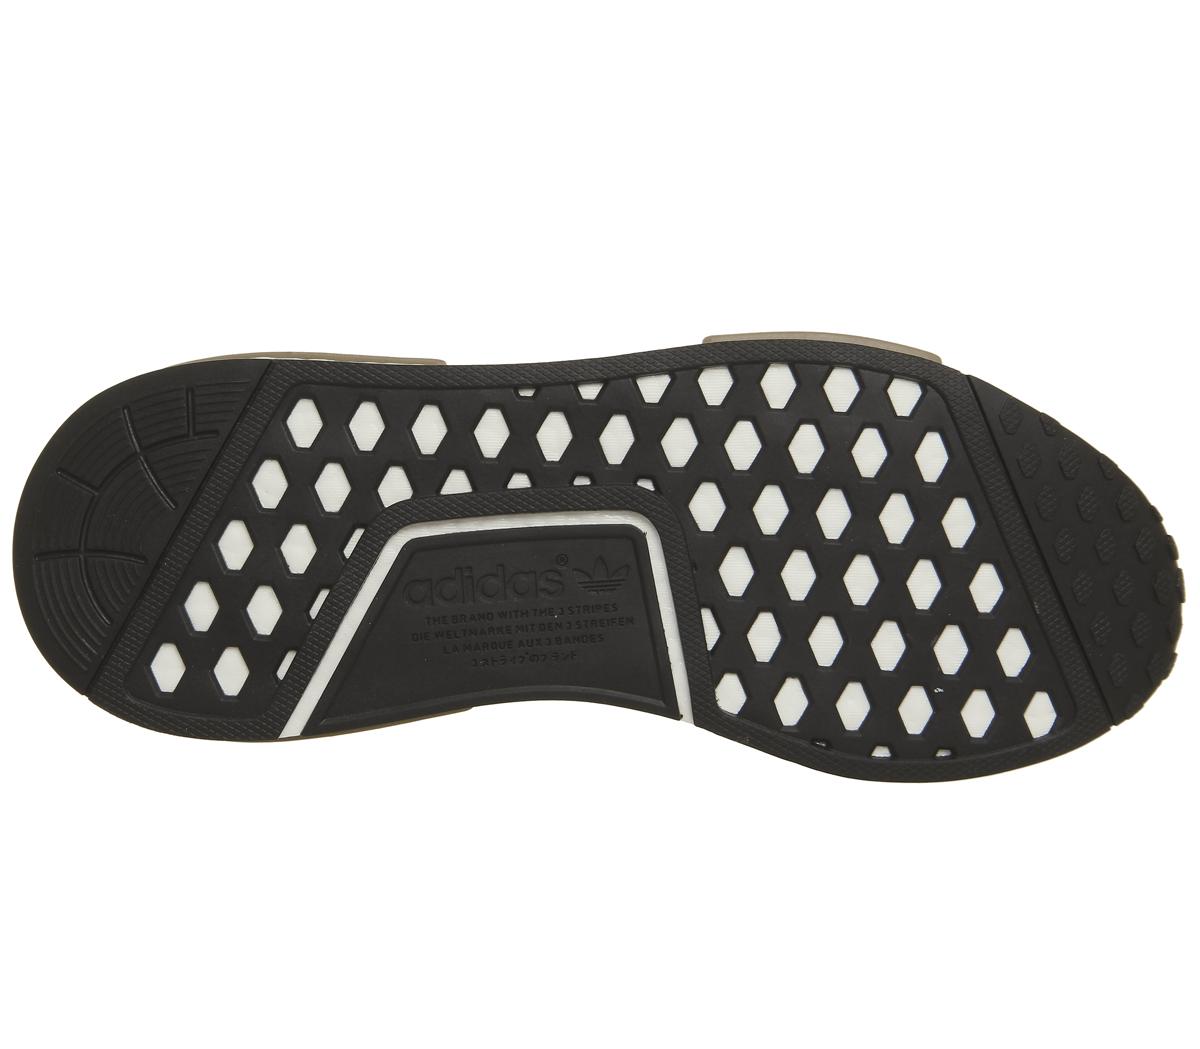 Adidas-Nmd-R1-Scarpe-da-ginnastica-Raw-cartone-d-039-oro-Scarpe-Da-Ginnastica-Bianco